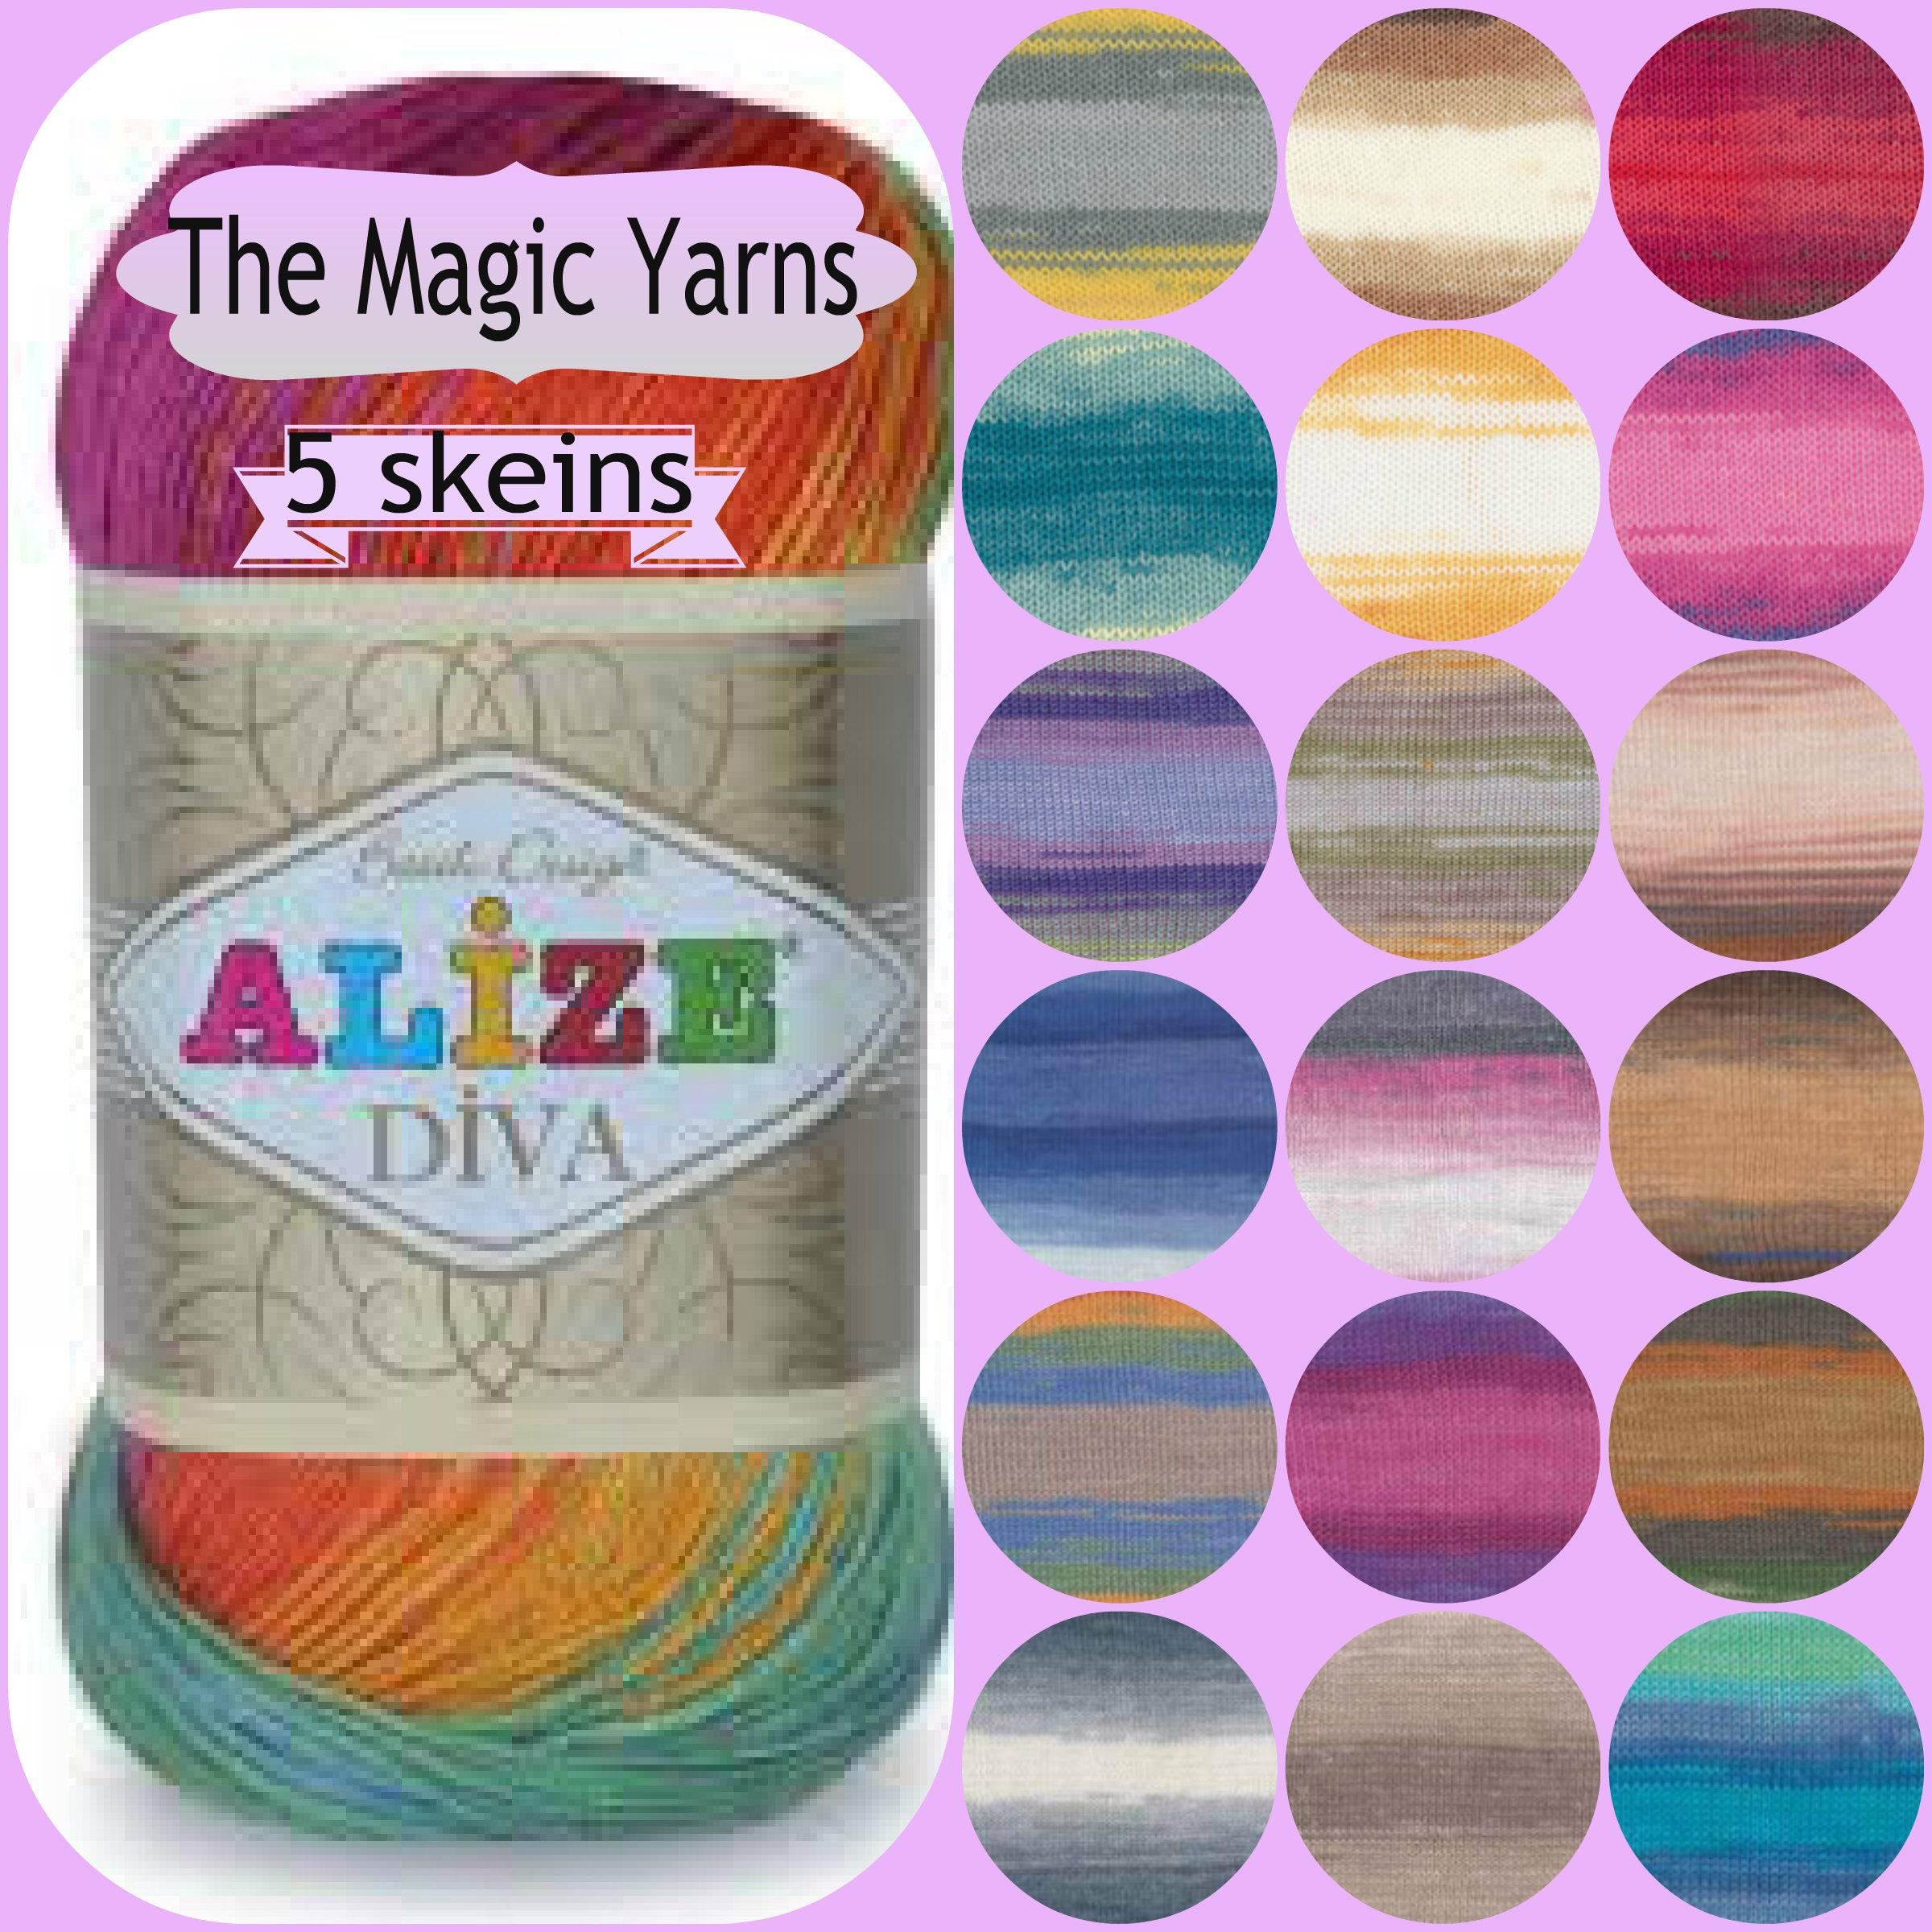 Light Weight Alize Diva Batik Yarn Set Of 5 Skeinssport4